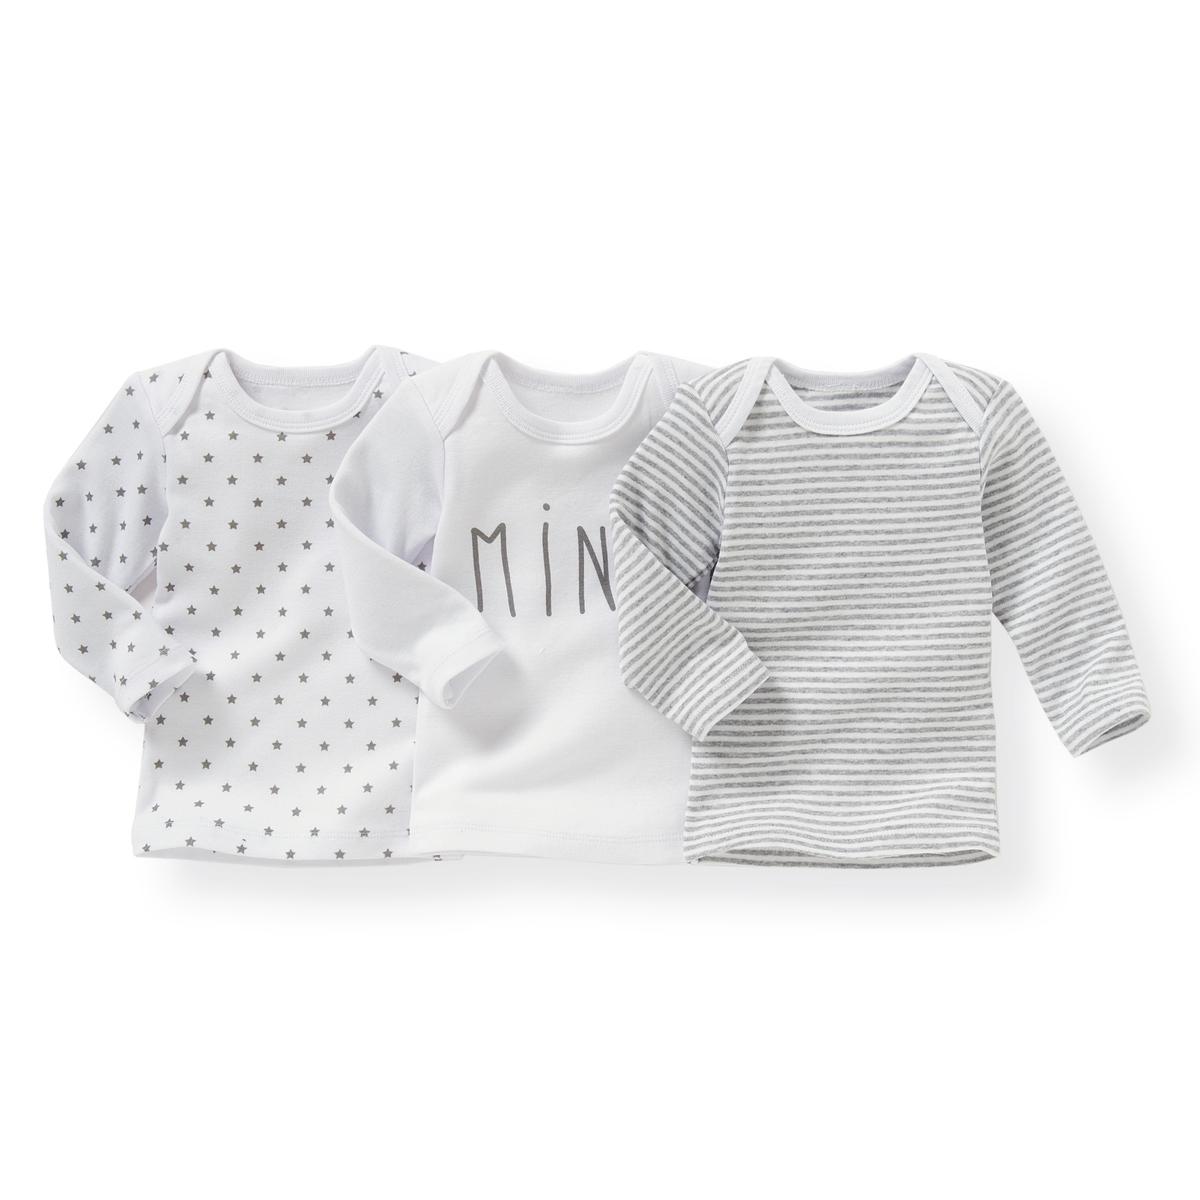 3 футболки хлопковых с рисунком, 0 мес.- 3 лет Oeko Tex